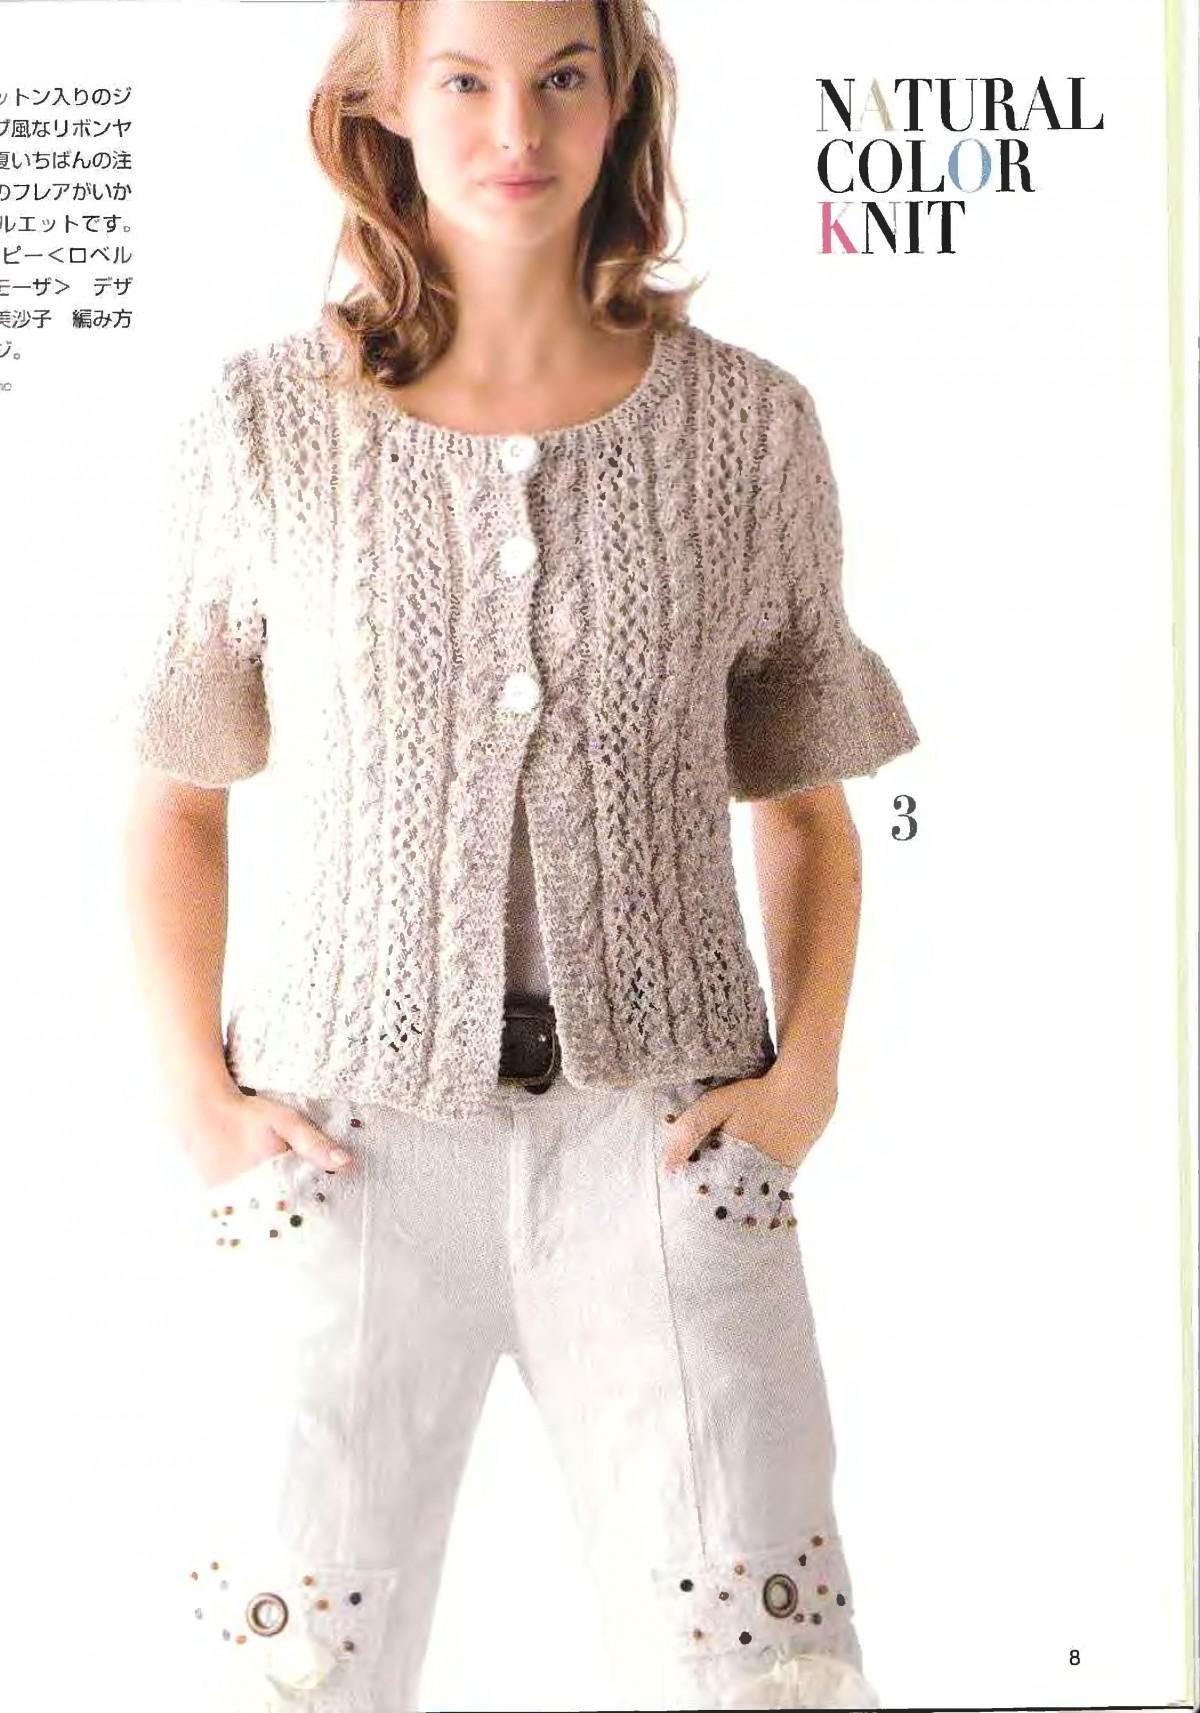 Lets-knit-series-NV4359-2008-Spring-Summer-sp-kr_6.jpg